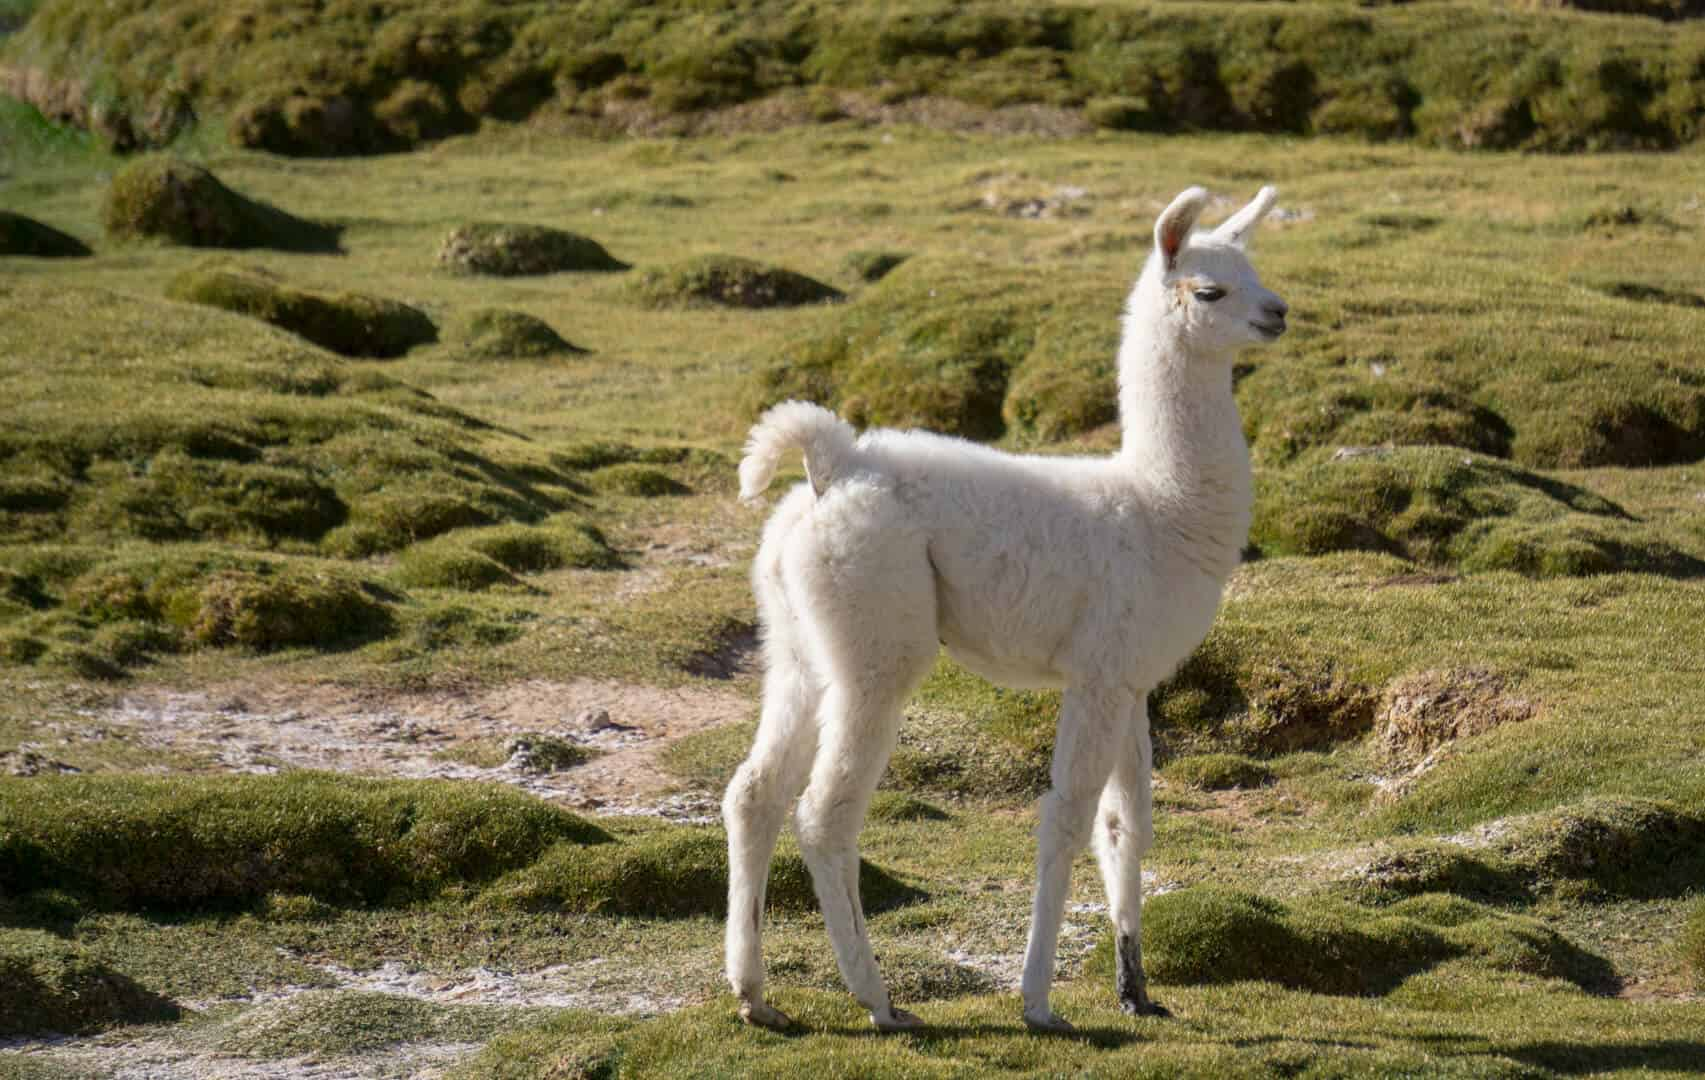 Sweetest baby Llama in Bolivia